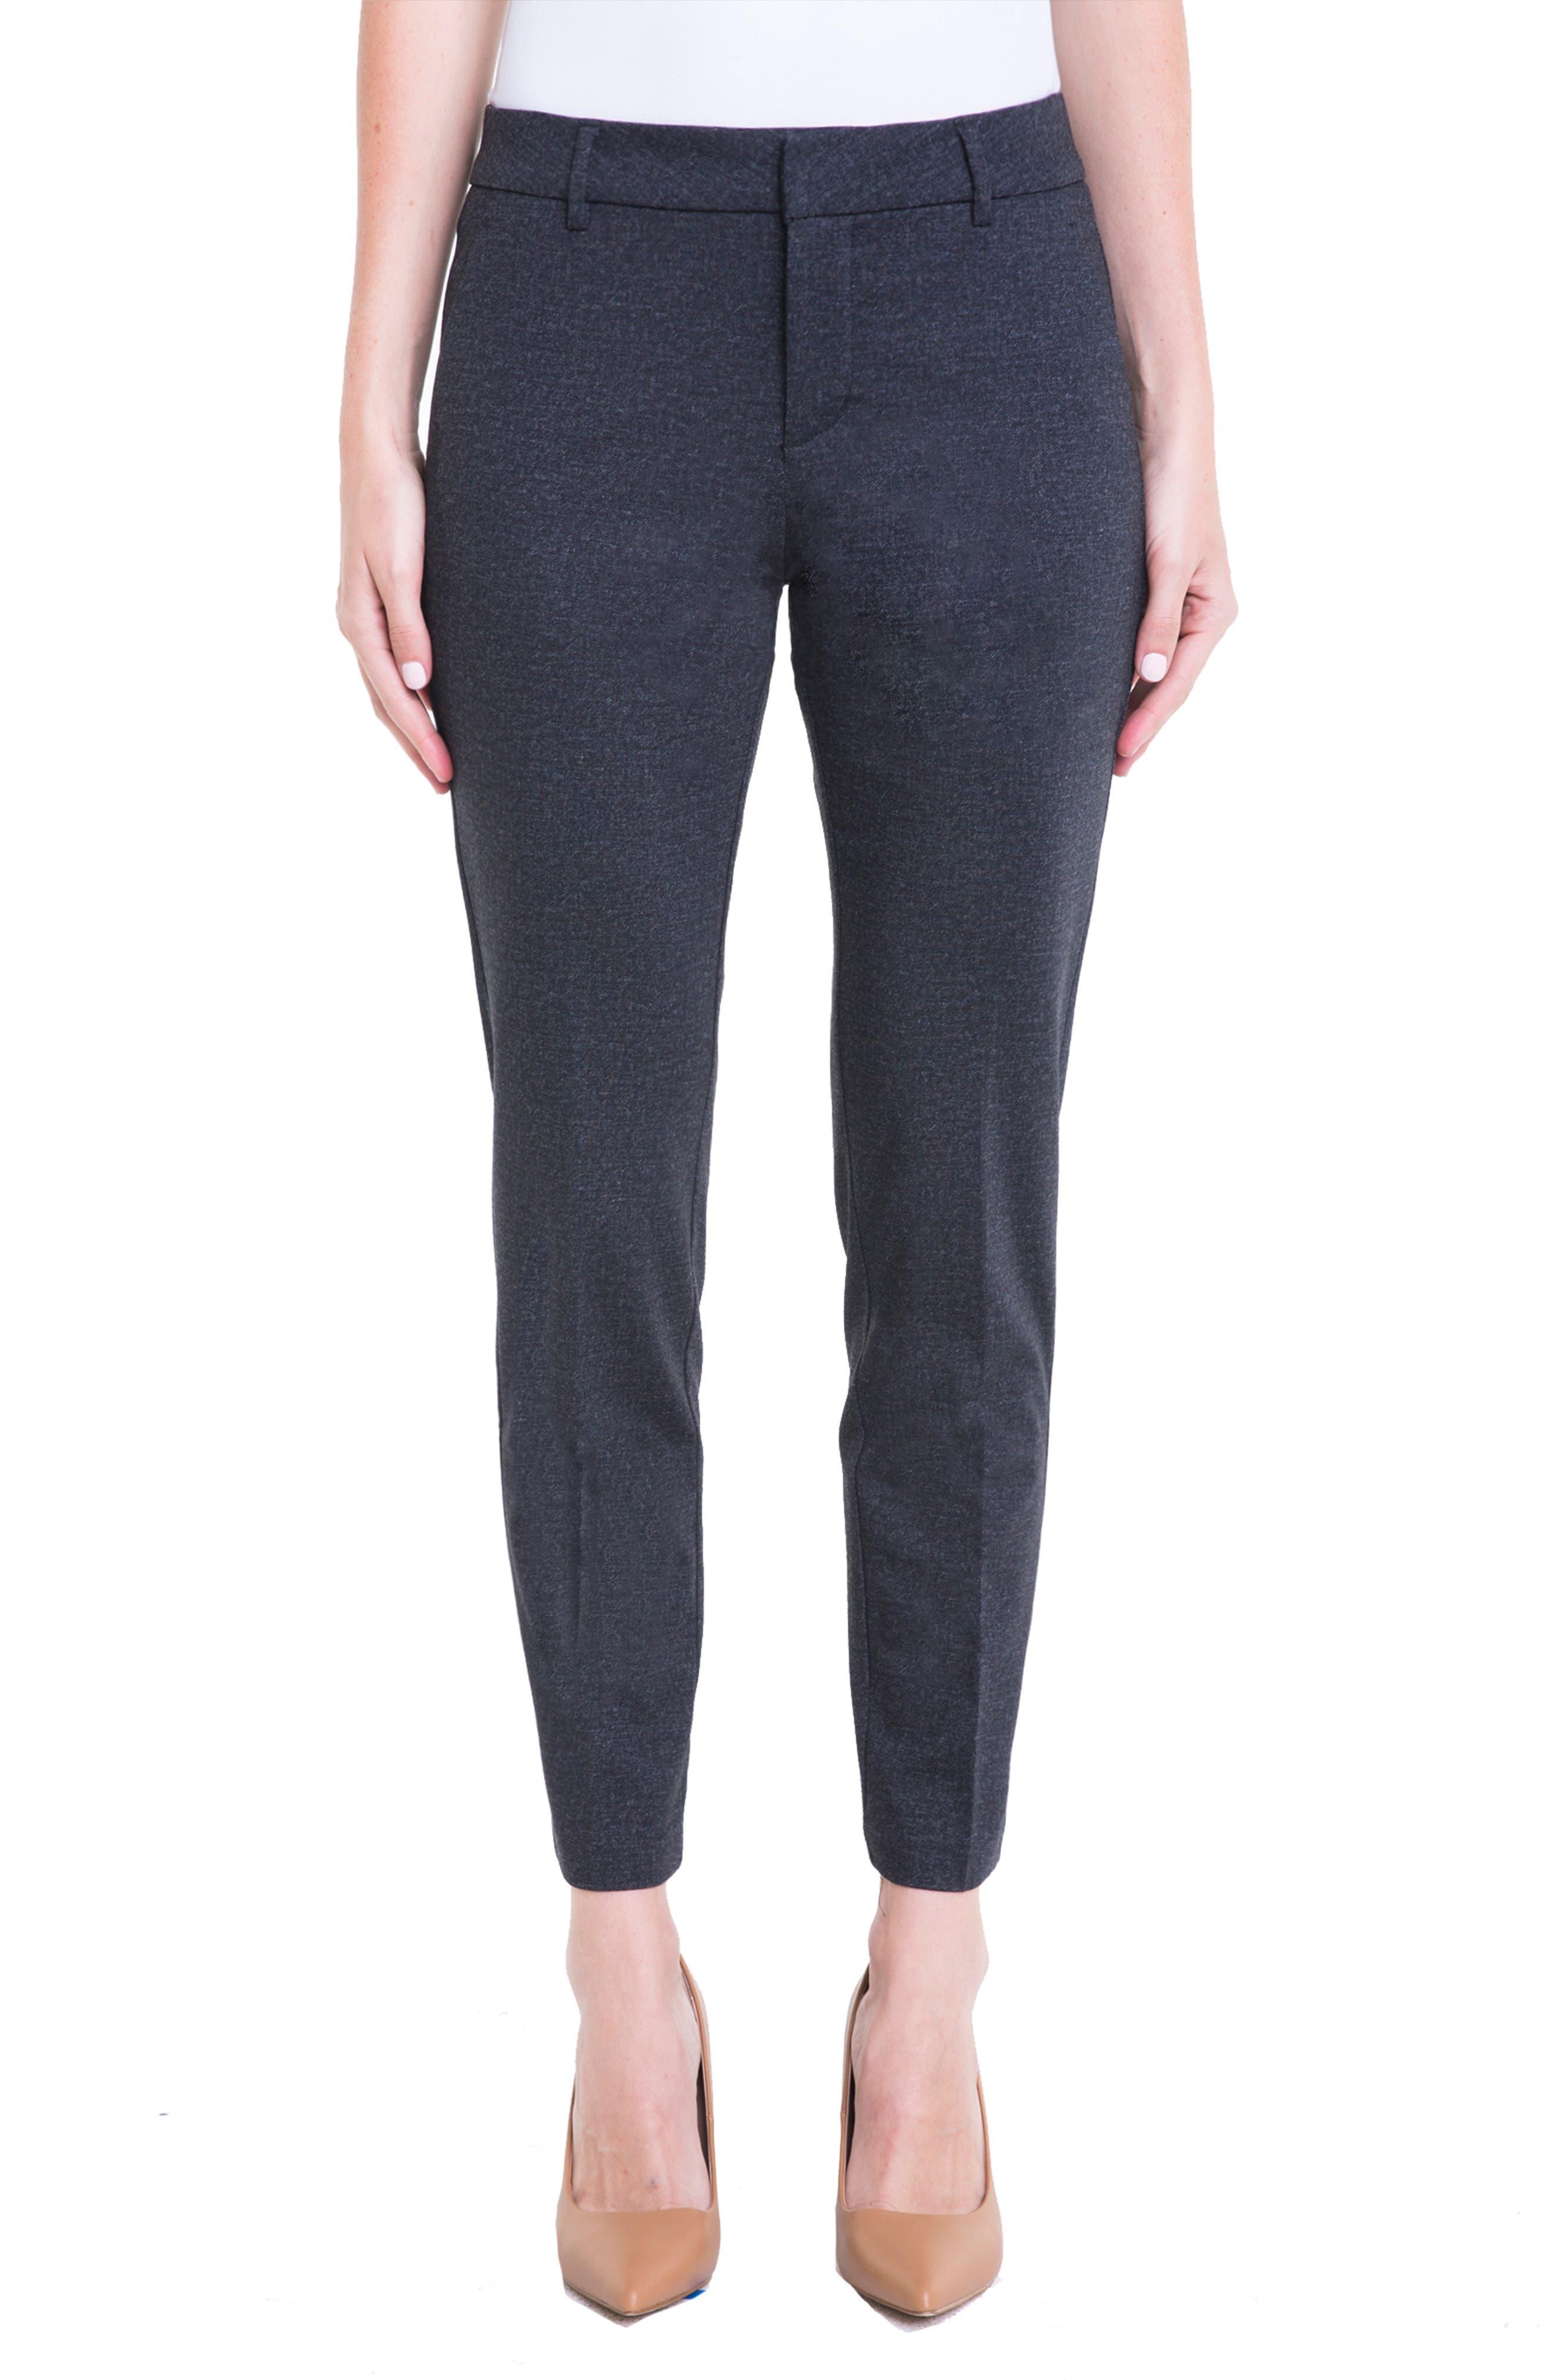 LIVERPOOL Kelsey Knit Trousers in Grey Heather Tweed